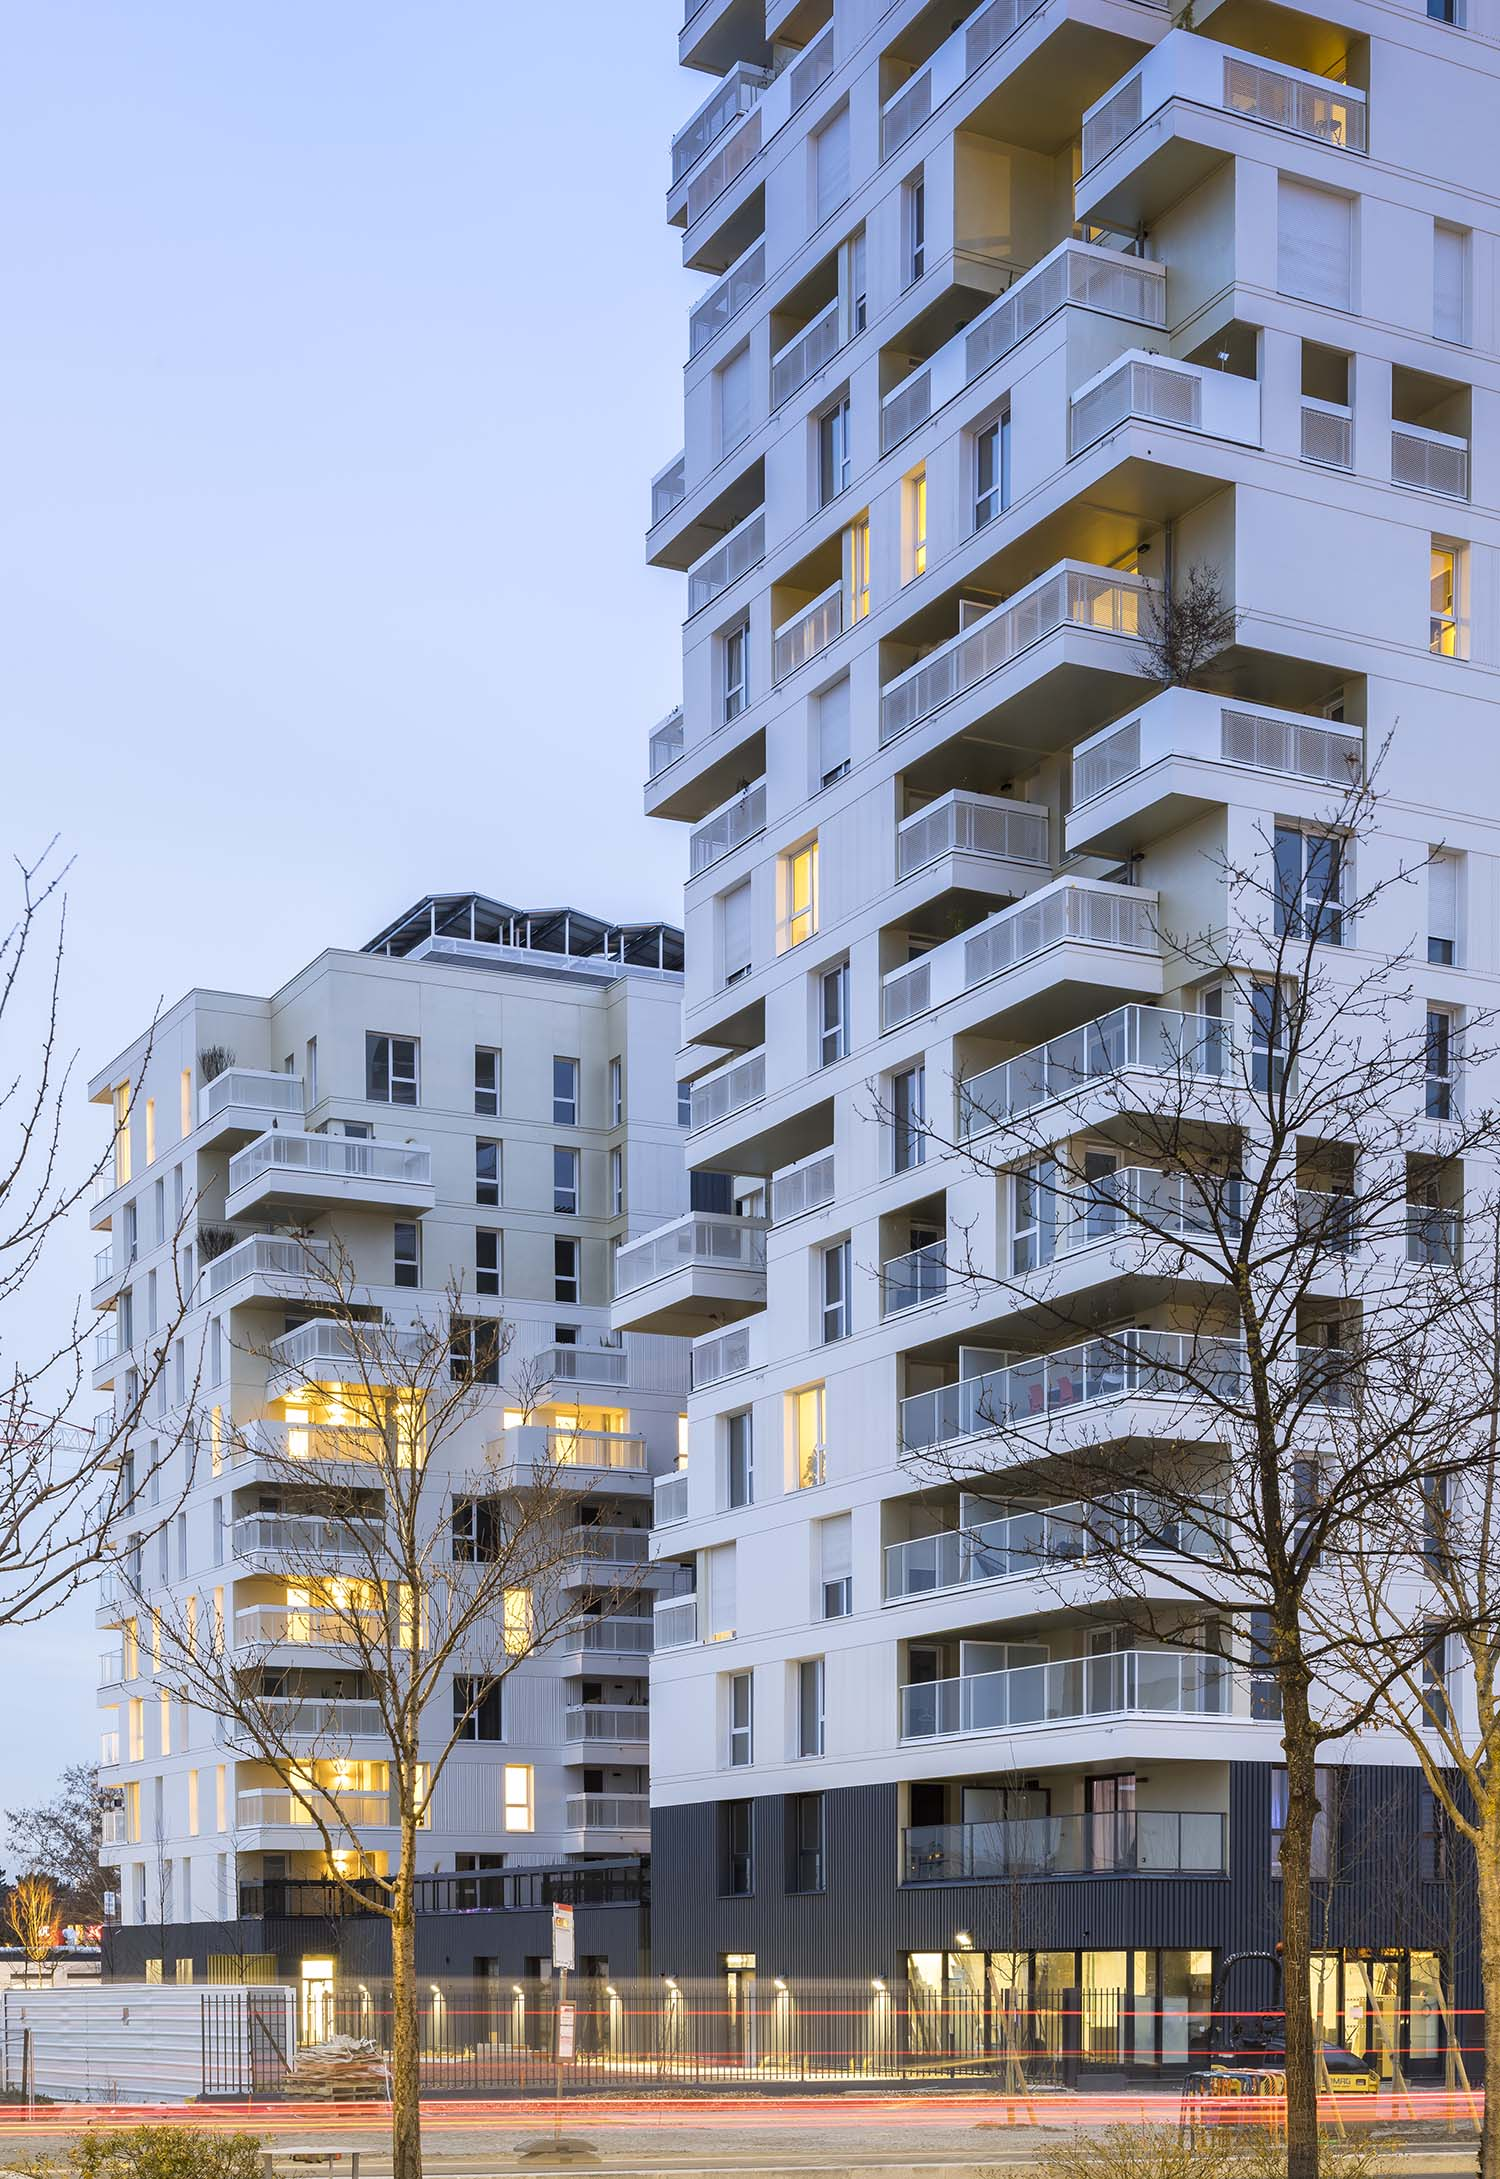 PETITDIDIERPRIOUX Architectes - 152 housing units in Villeurbanne - South facade Sergio Grazia